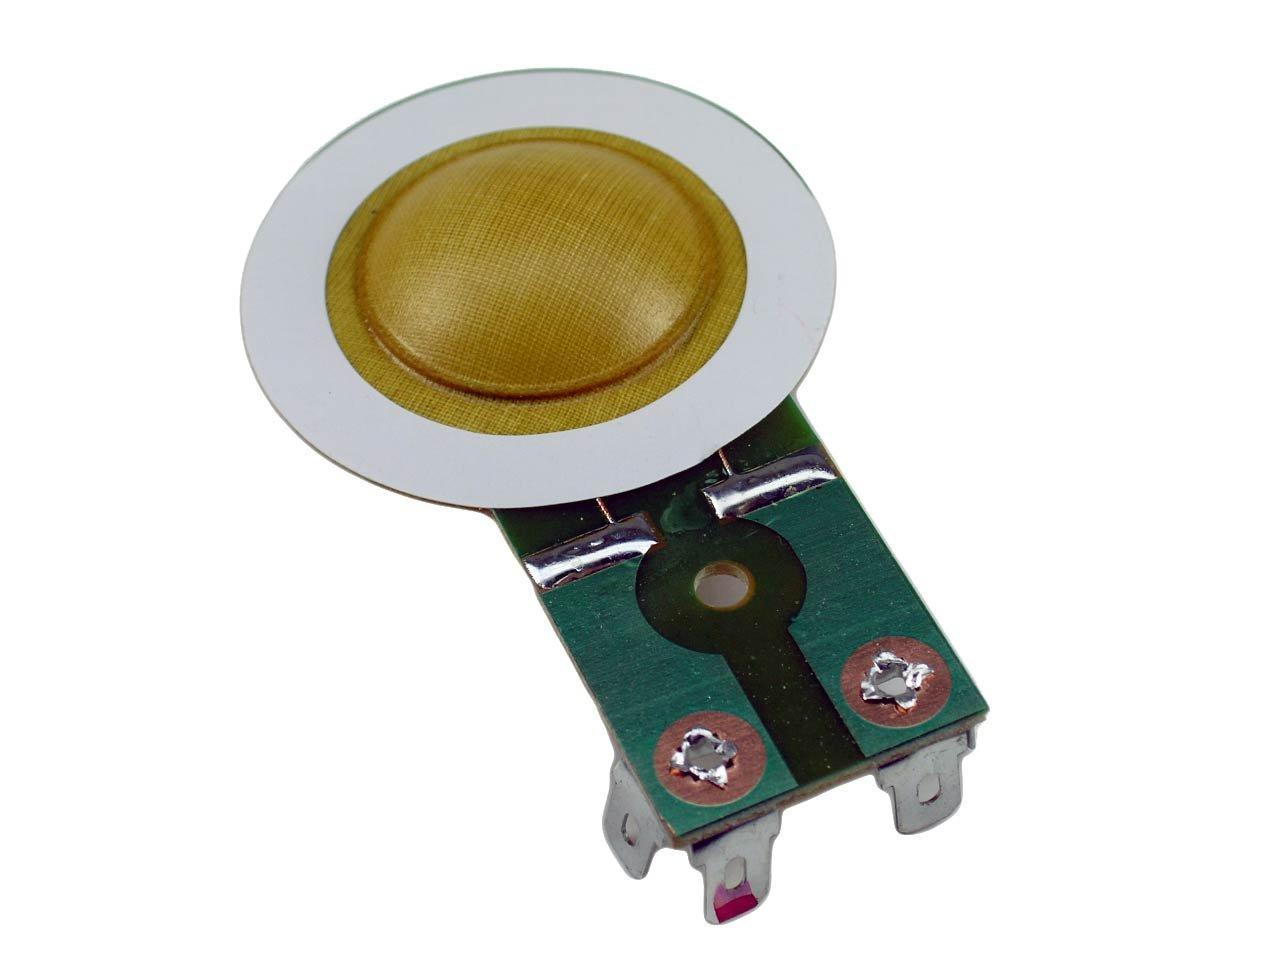 Foster Factory Style Replacement Speaker Diaphragm N30, 025, H025, N27, N28